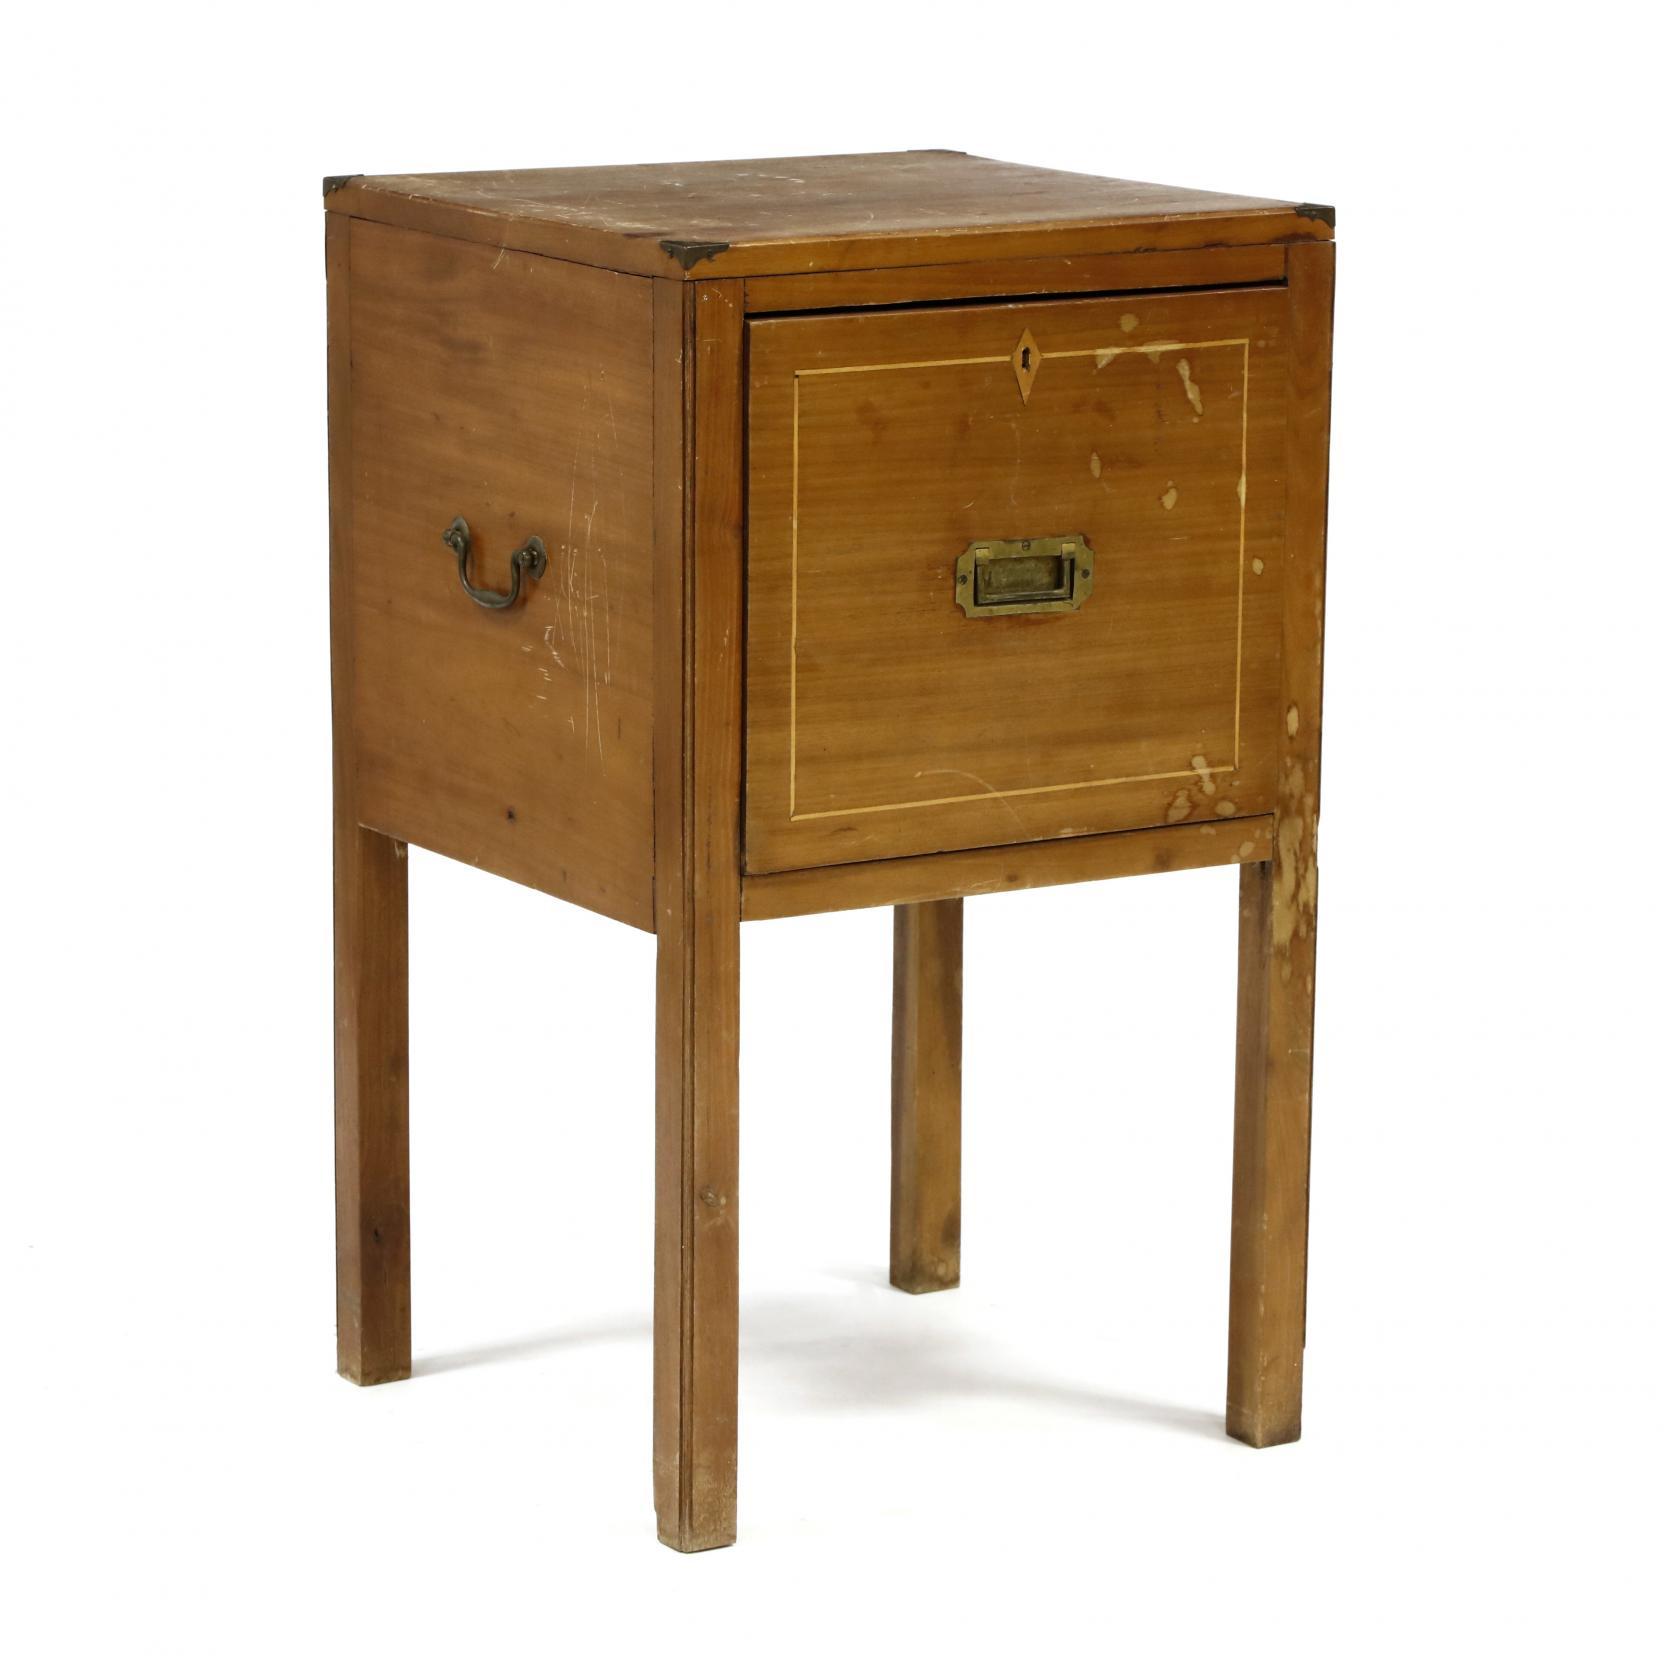 george-iii-inlaid-mahogany-cellaret